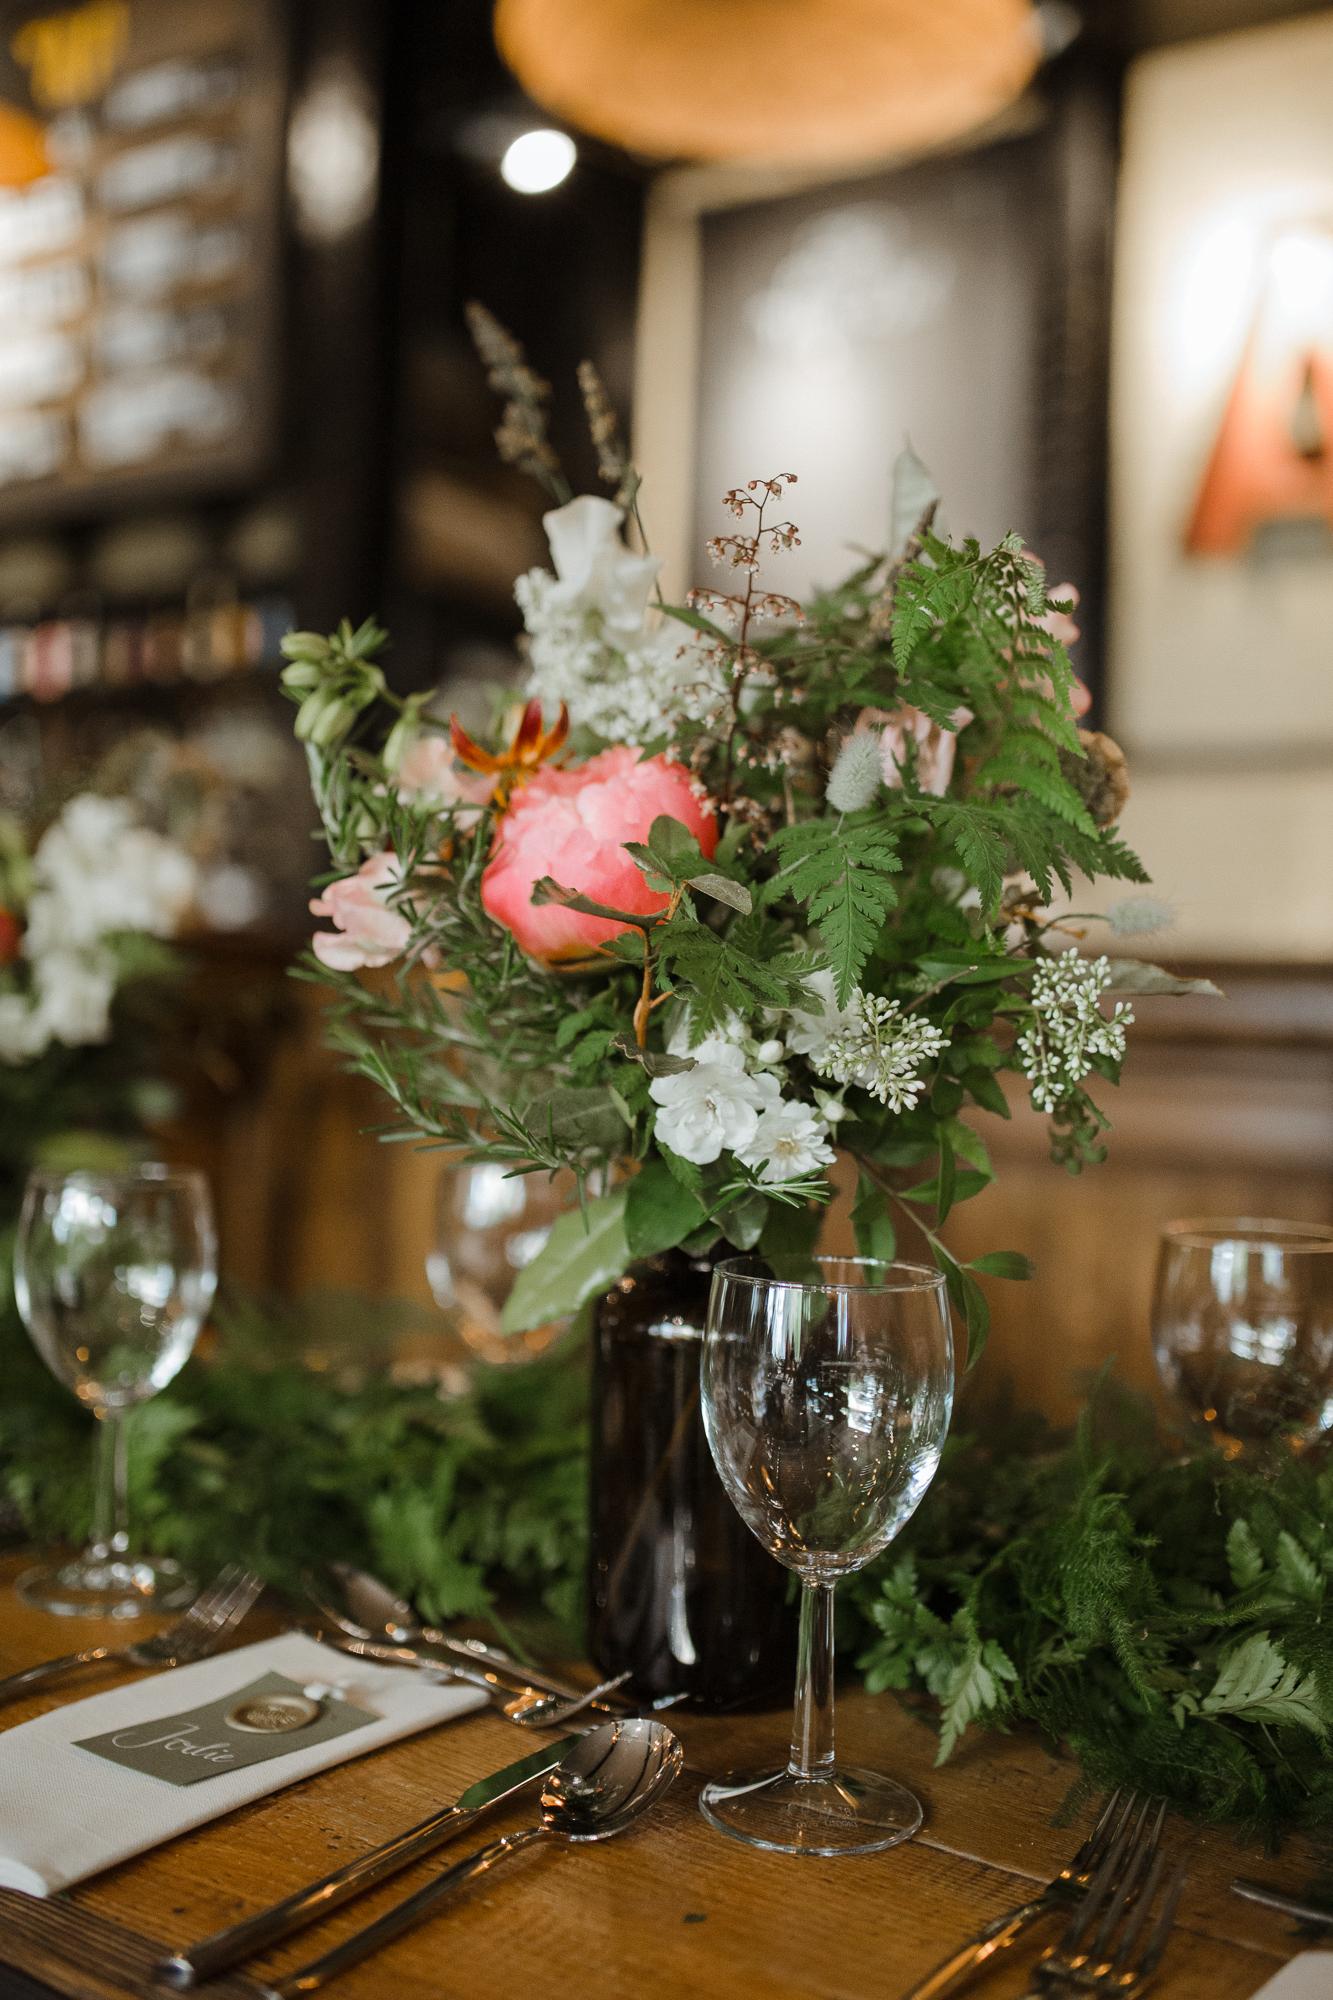 stephanie-green-wedding-photography-sulaflowers-sula-flowers-london-islington-town-hall-depot-n7-91.jpg